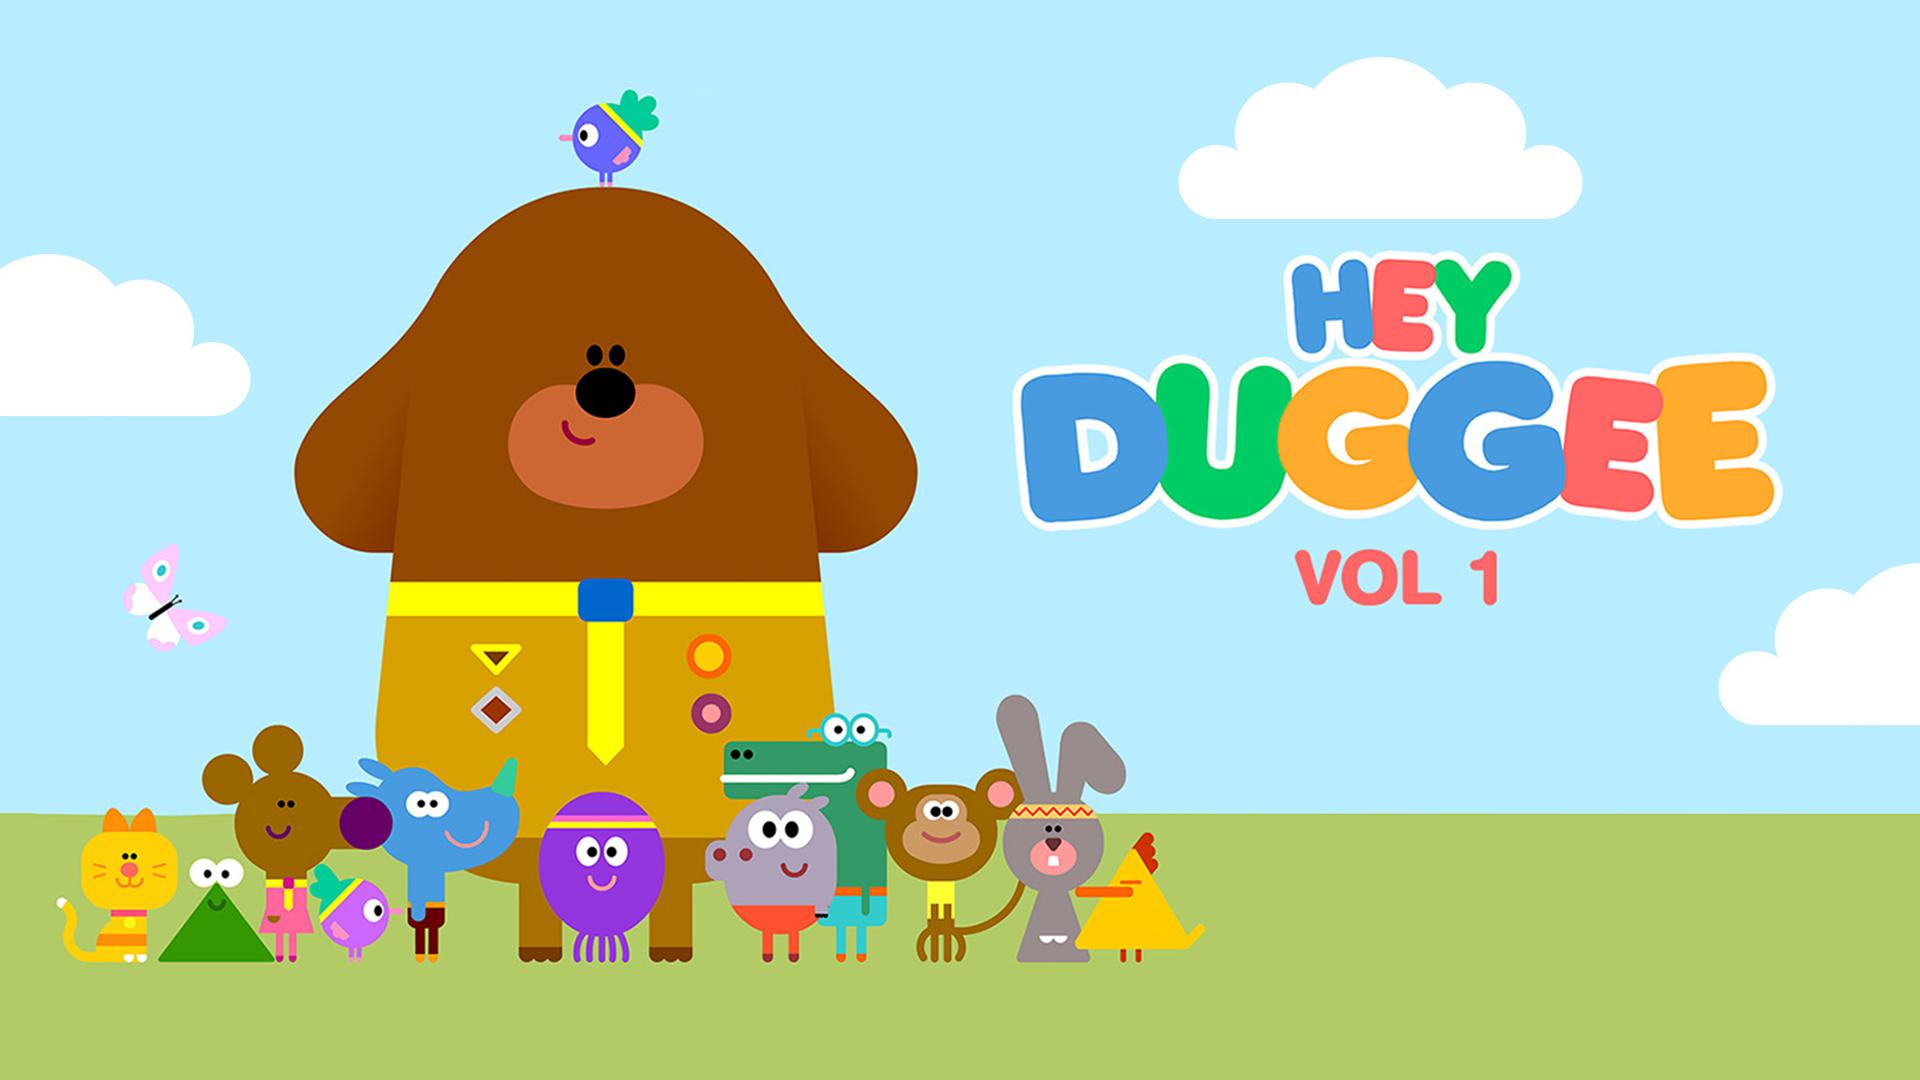 Hey Duggee, Vol. 1